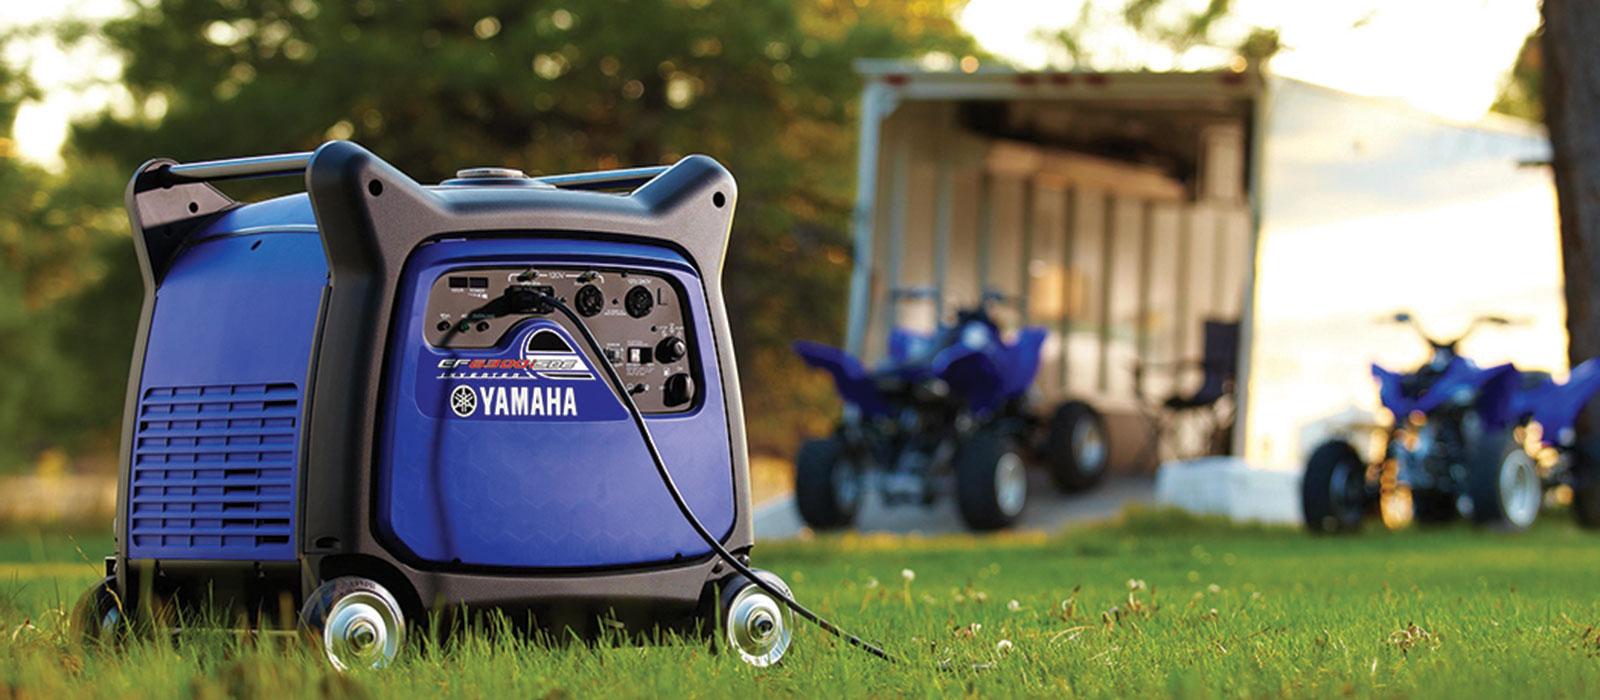 Clayton Marina Yamaha Generator